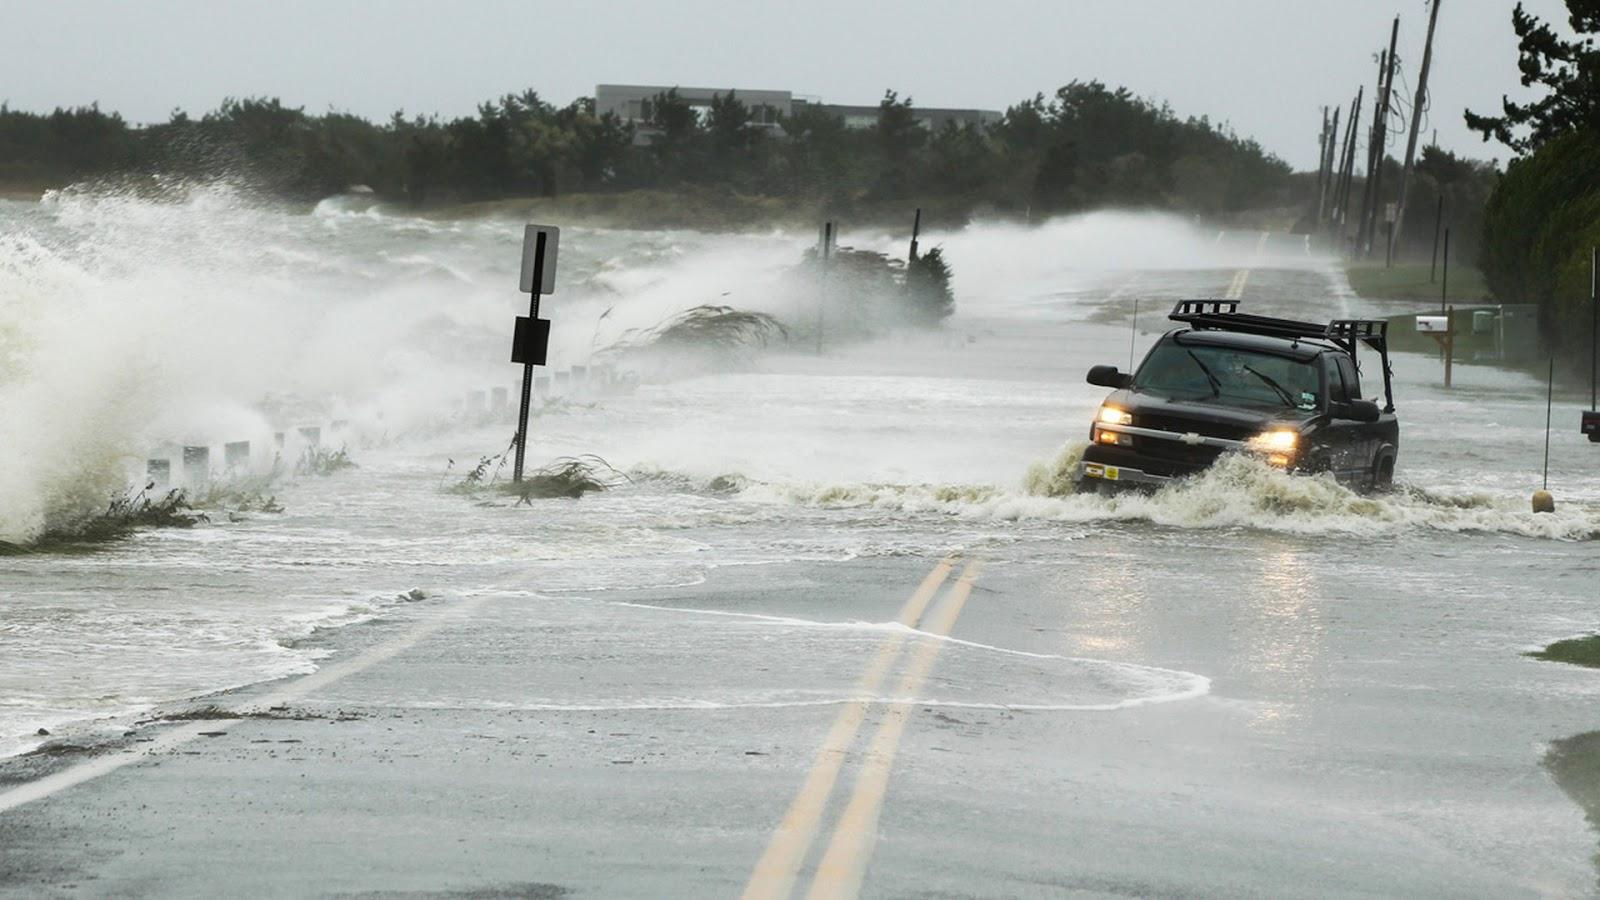 Hd Wallpaper Sandy Hurricane Storm Hd Images Photos